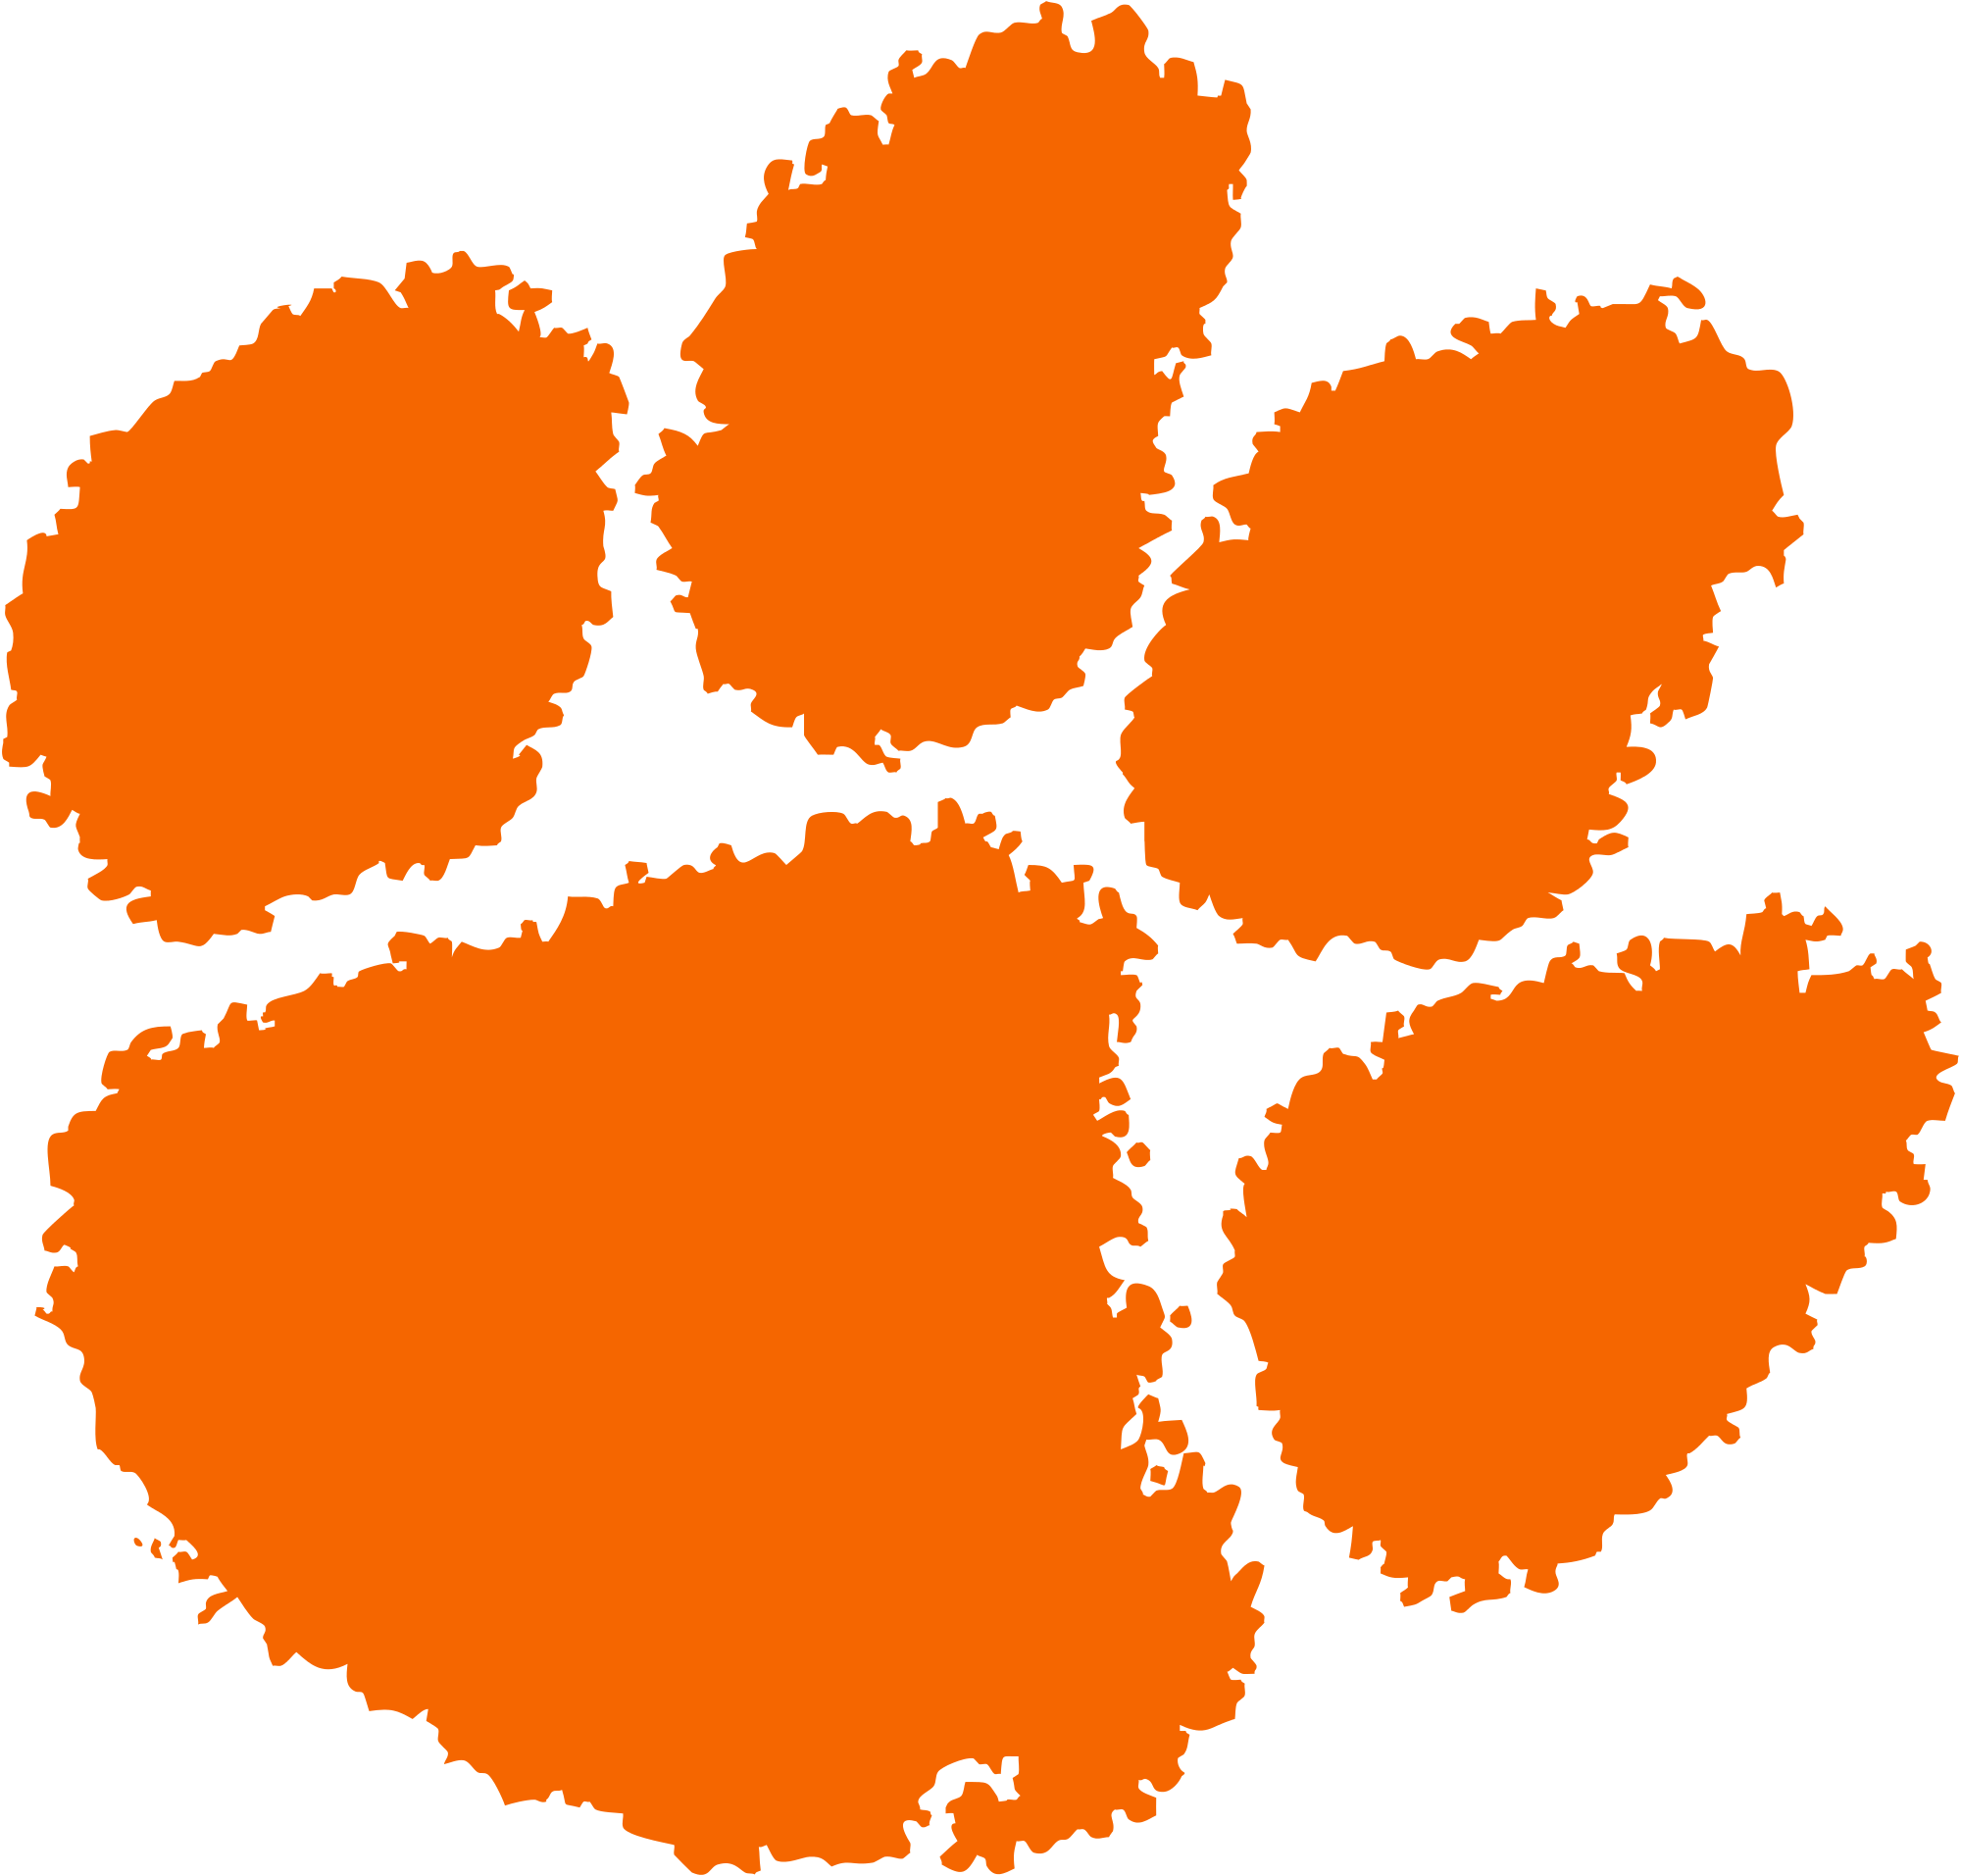 Clemson_University_Tiger_Paw_logo.svg